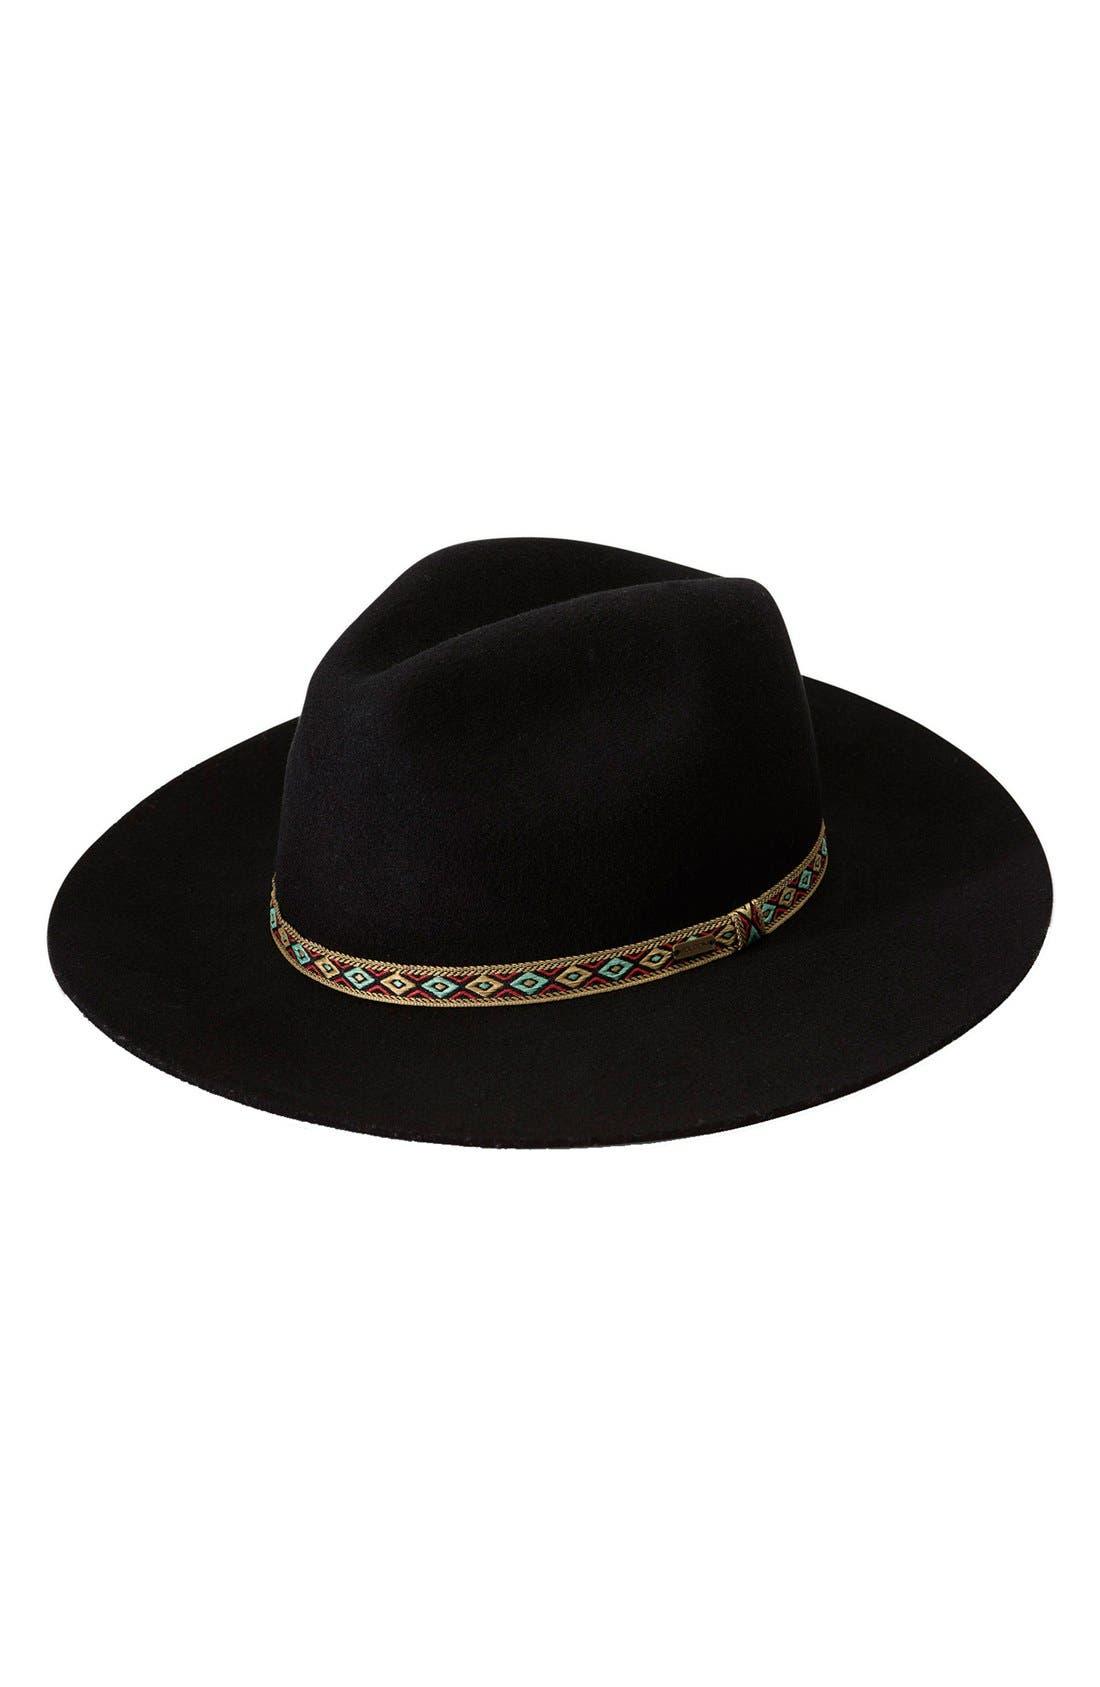 'Buckaroo' Fedora Hat,                             Main thumbnail 1, color,                             001